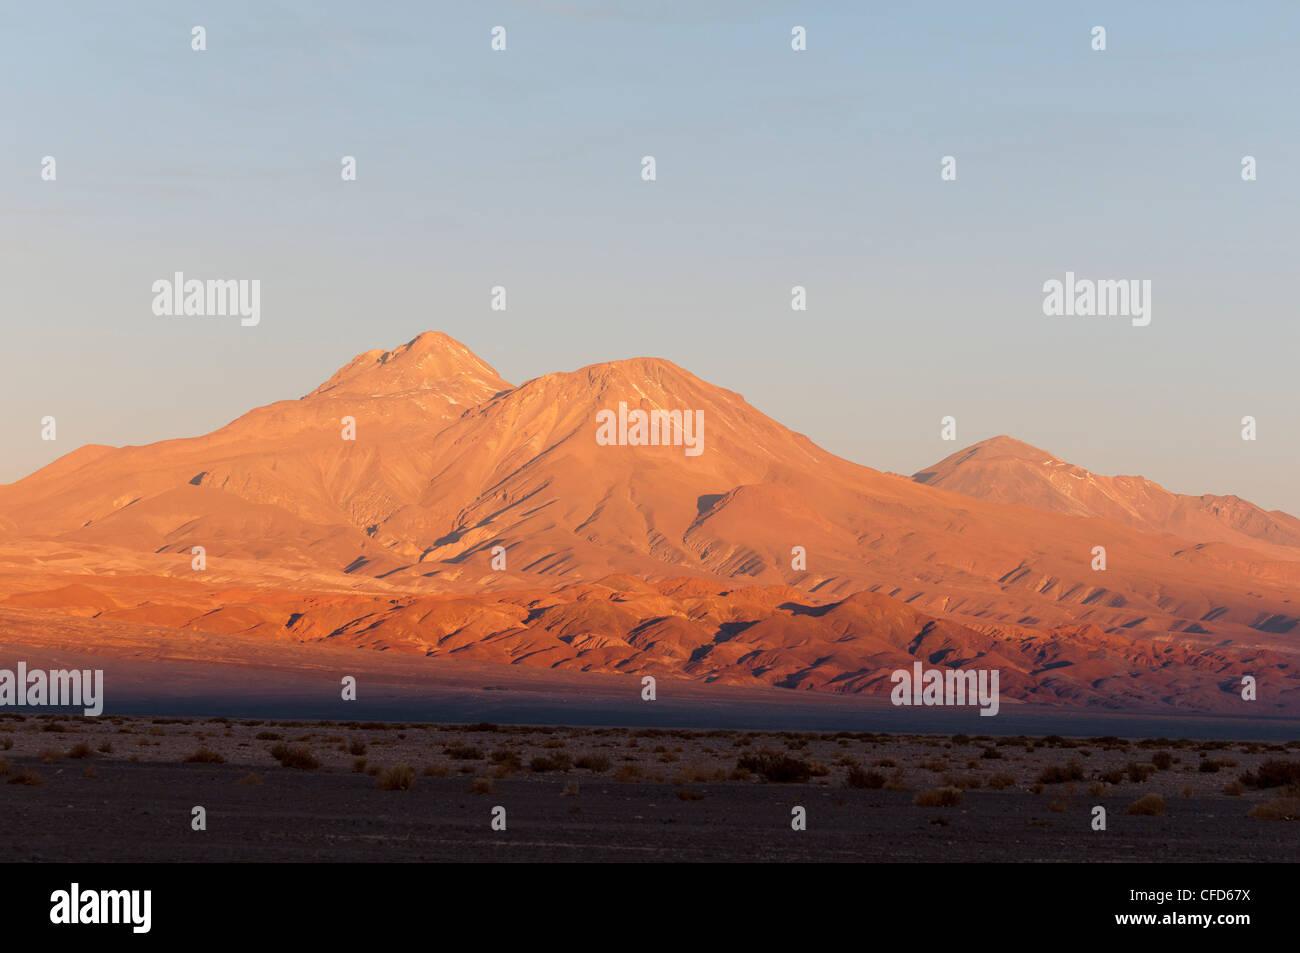 Salar de Atacama, Atacama Desert, Chile, South America - Stock Image